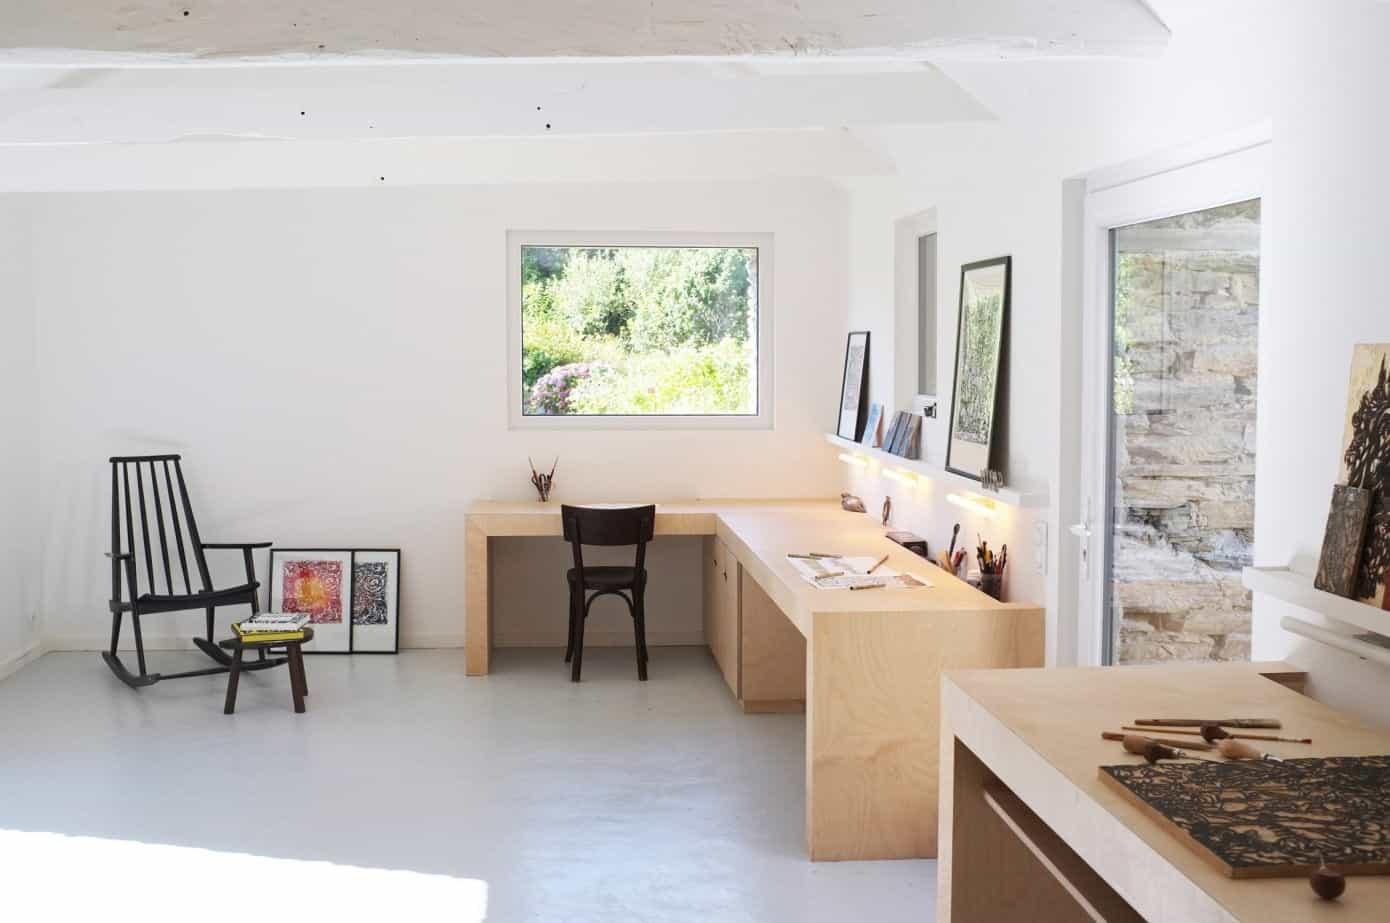 designrulz artist-studio-modal-architecture (15)